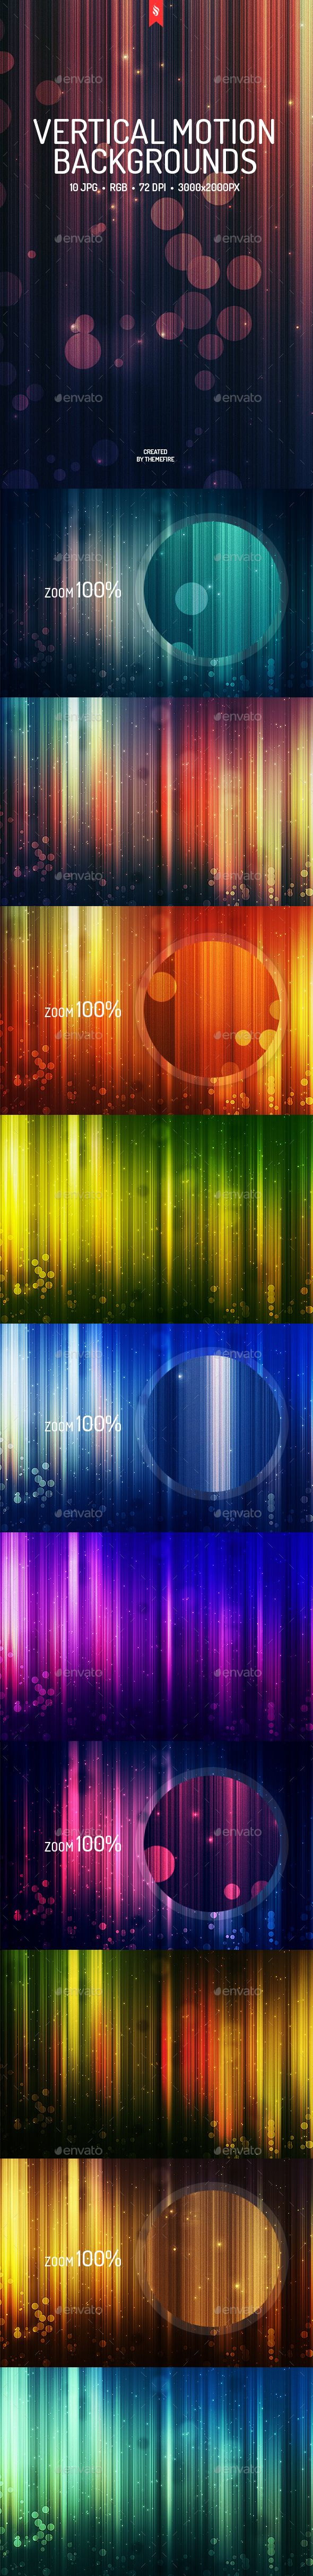 Vertical Motion Backgrounds  #light #desktop #lights • Click here to download ! http://graphicriver.net/item/vertical-motion-backgrounds/15883351?ref=pxcr